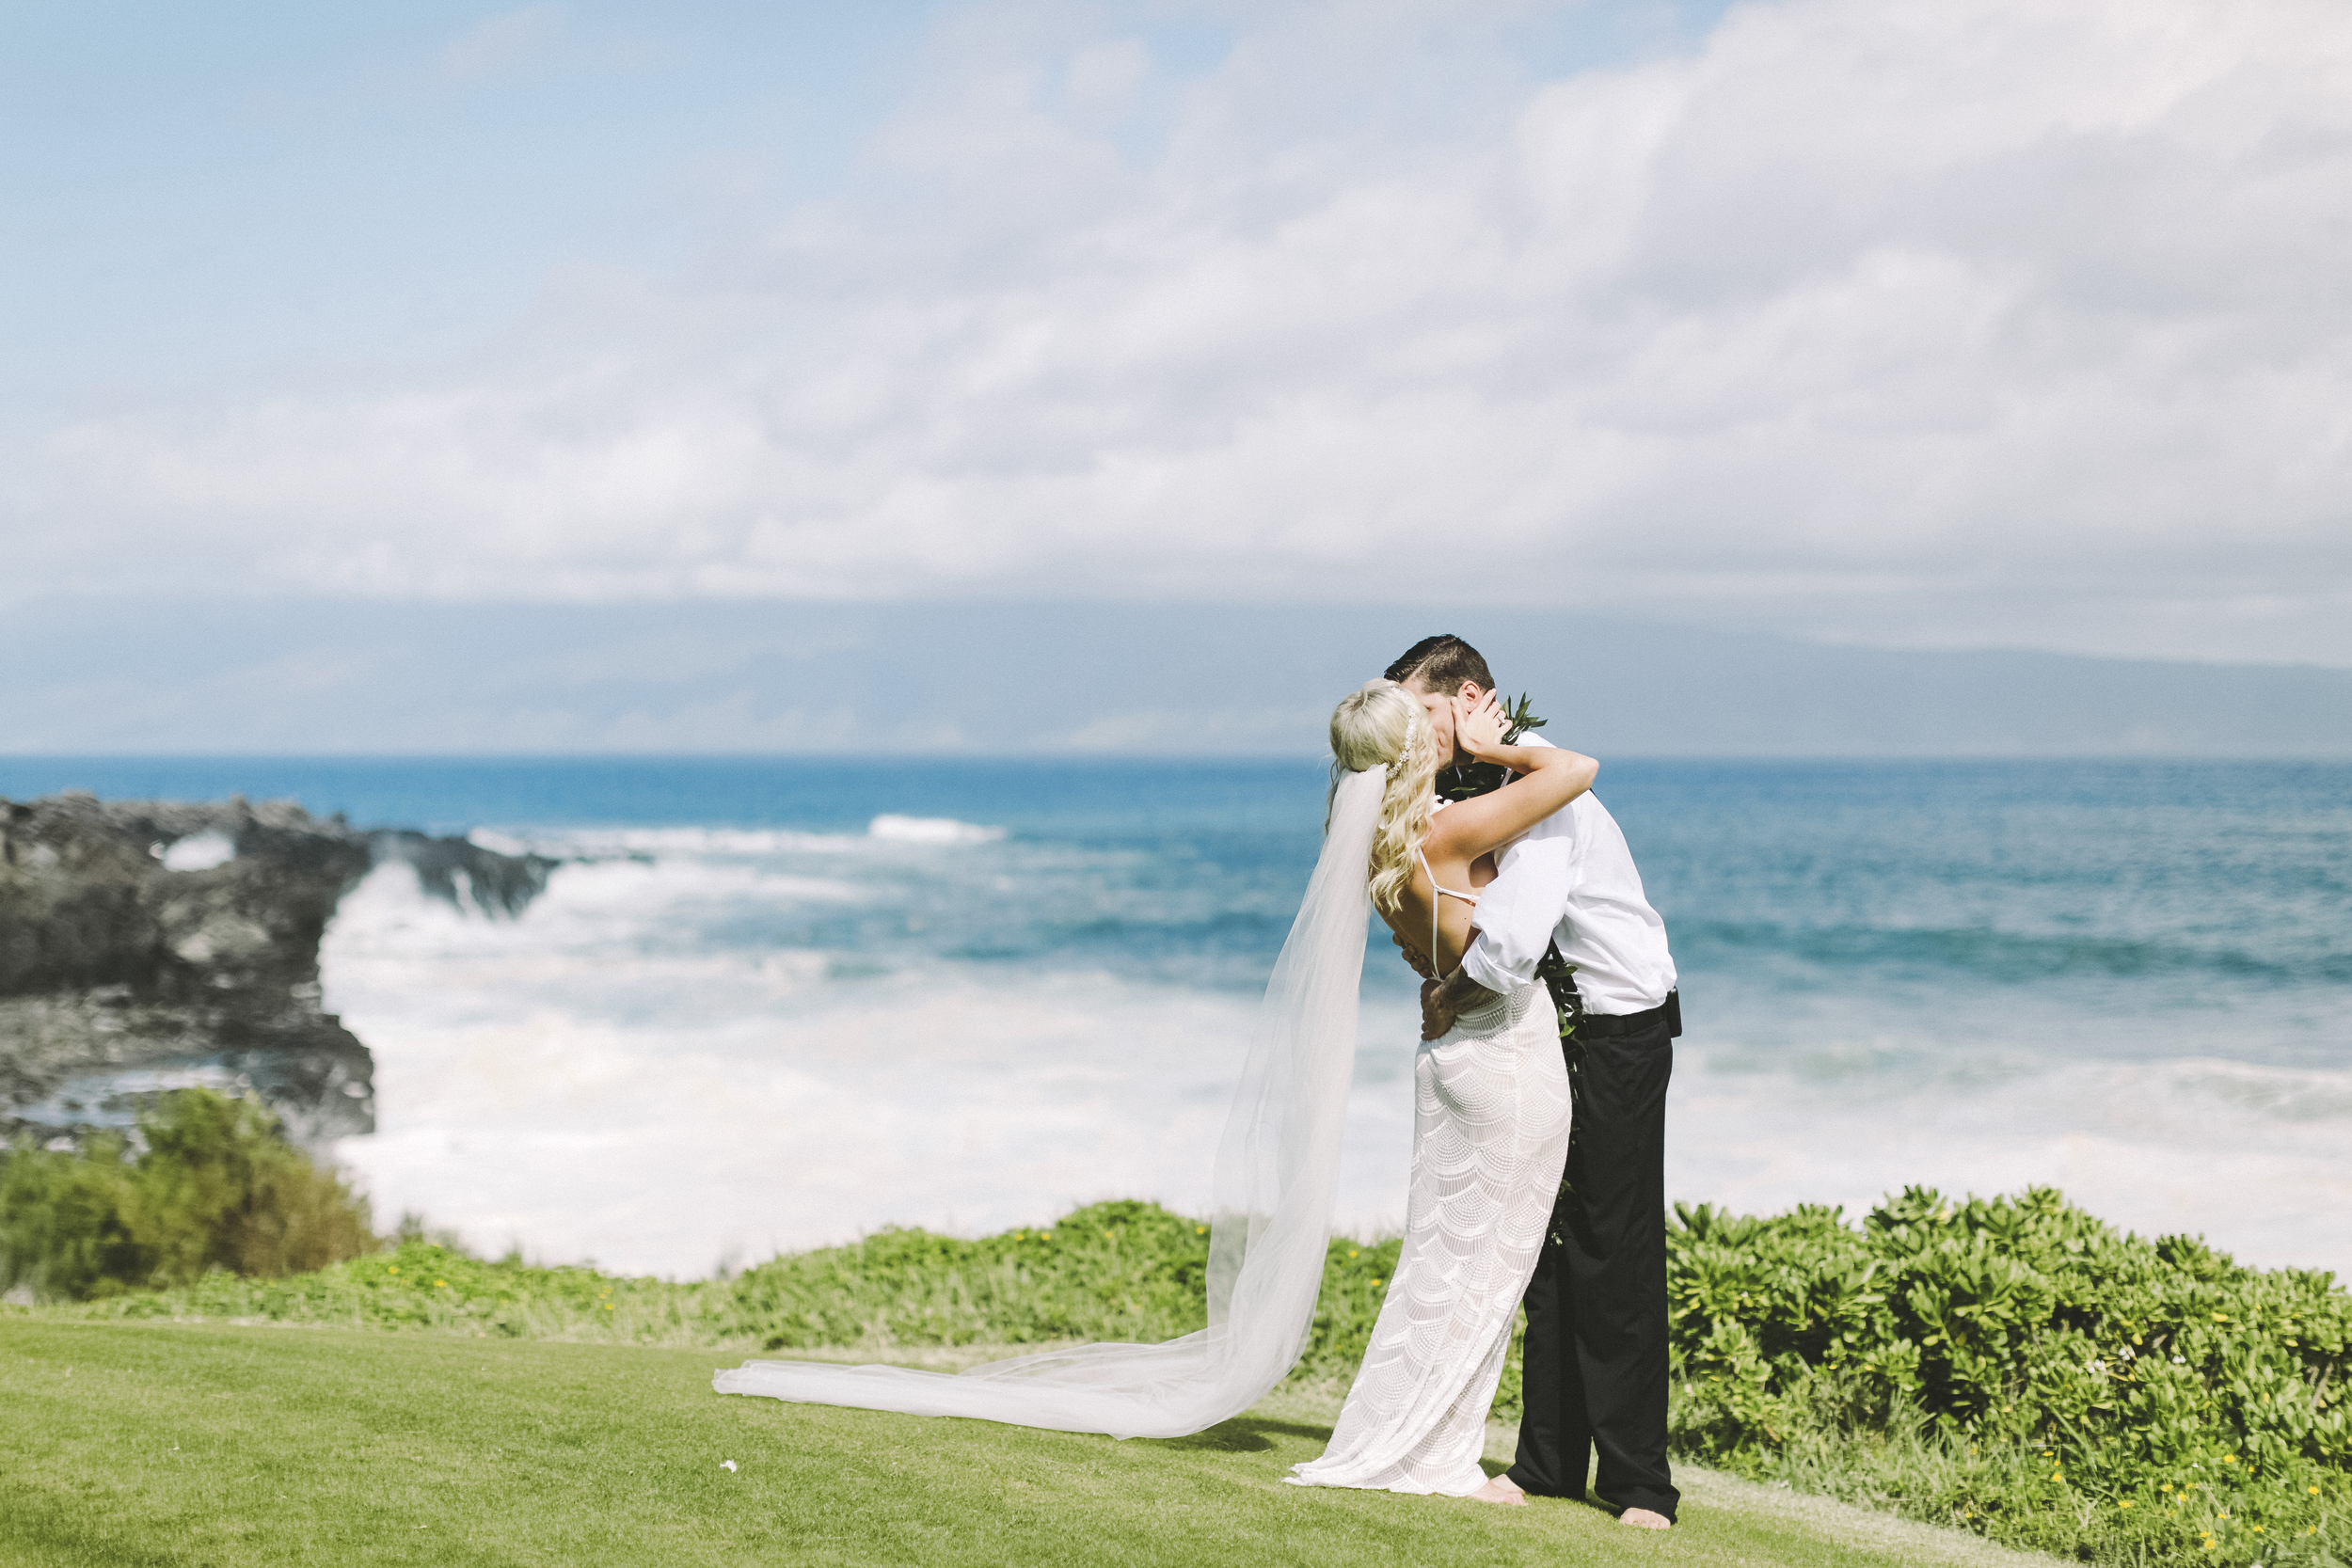 angie-diaz-photography-hawaii-wedding-21.jpg